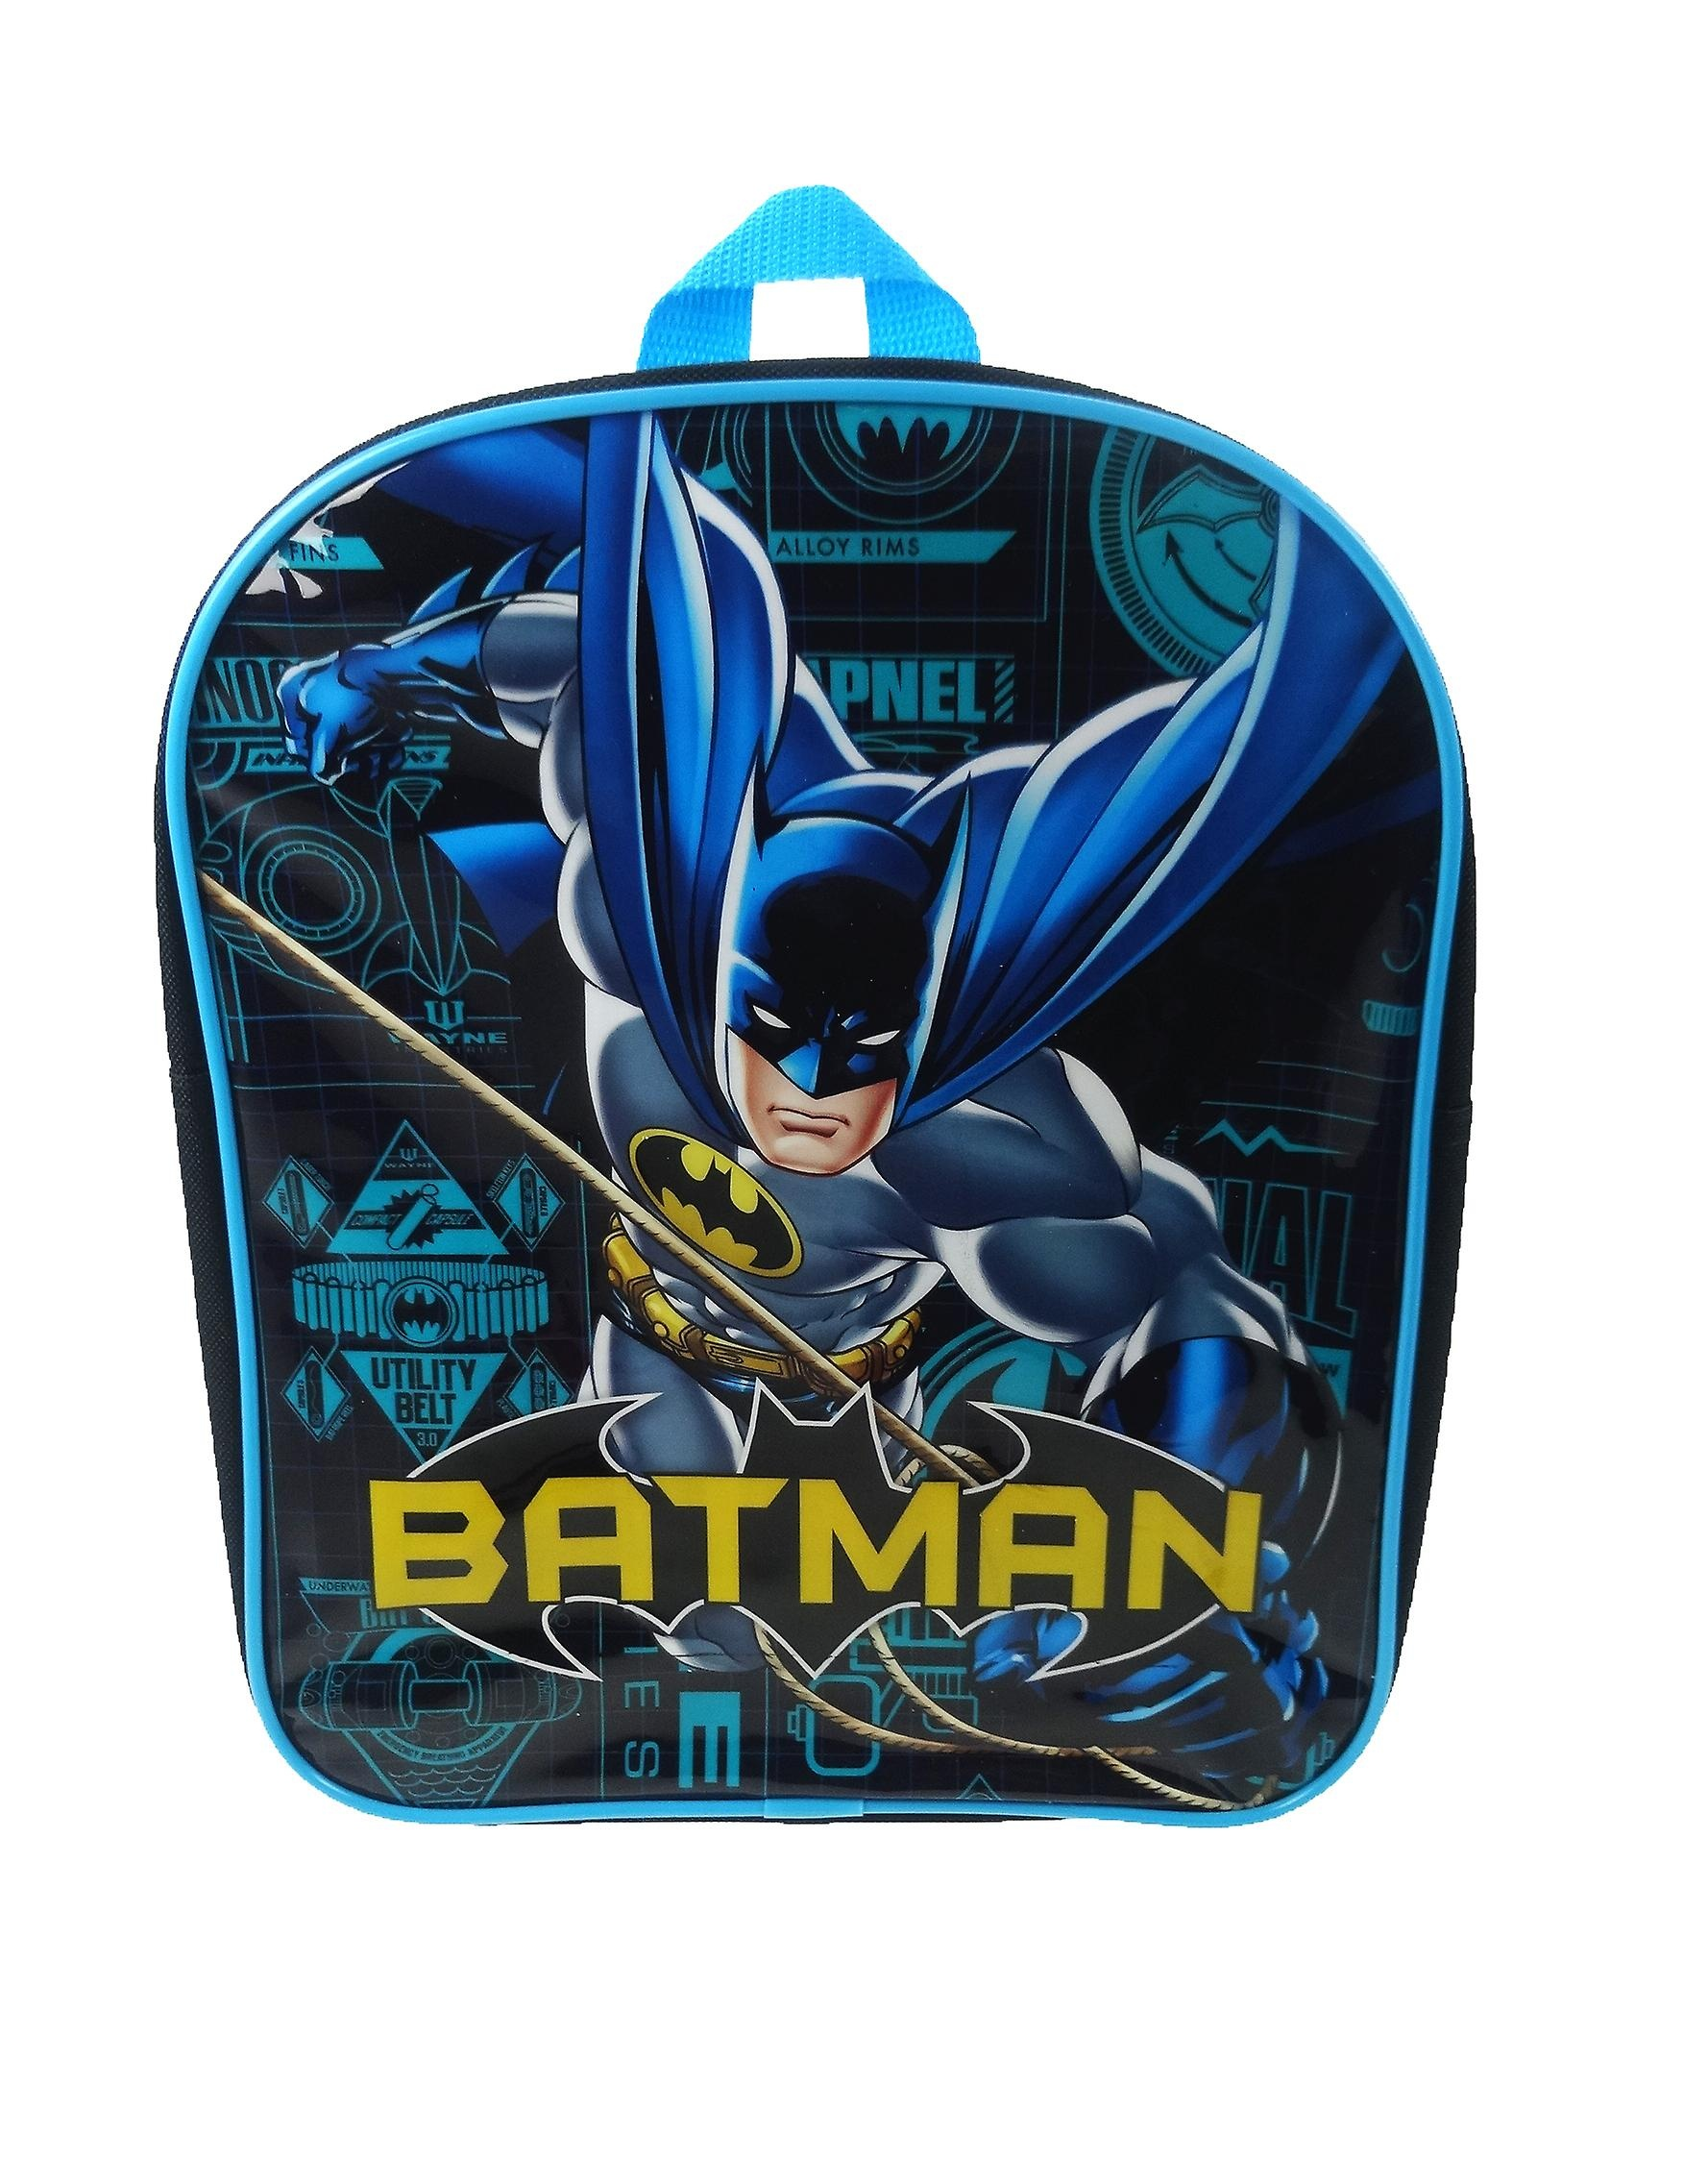 15a458cd0910 DC Comics backpack Batman blue 9 liter - Internet-Toys